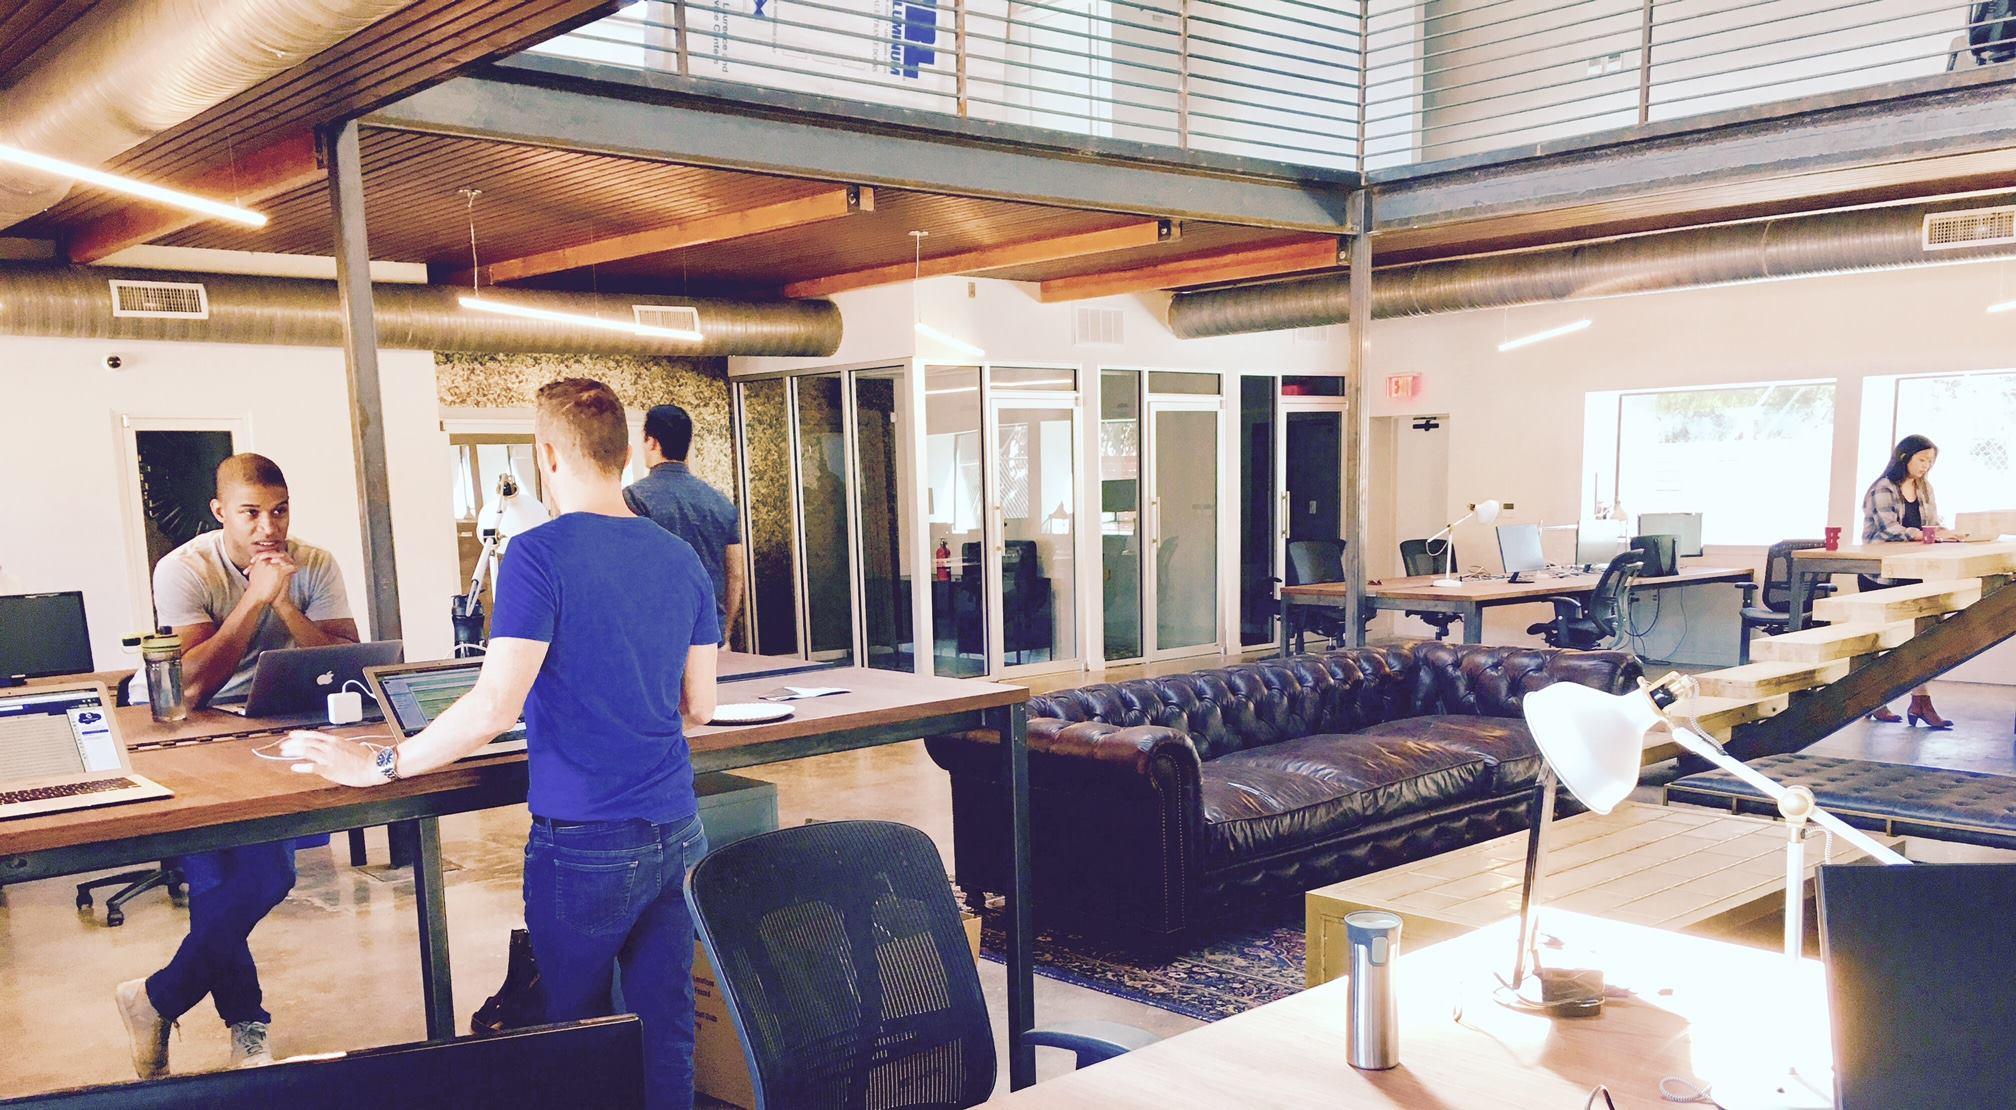 atx-factory-coworking-space-austin-tx